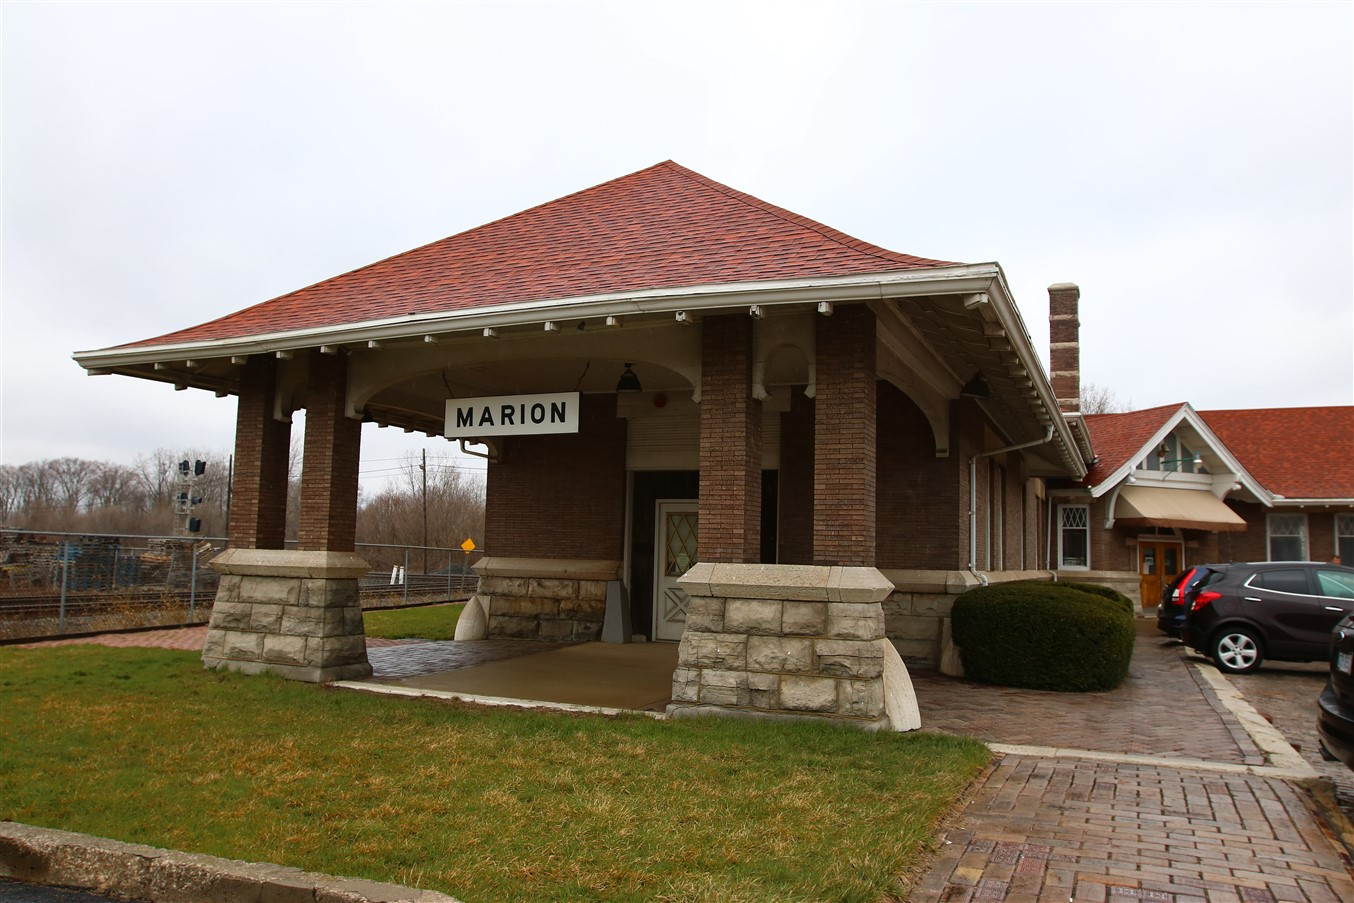 2017 03 18 313 Marion OH Railroad Club Depot.jpg